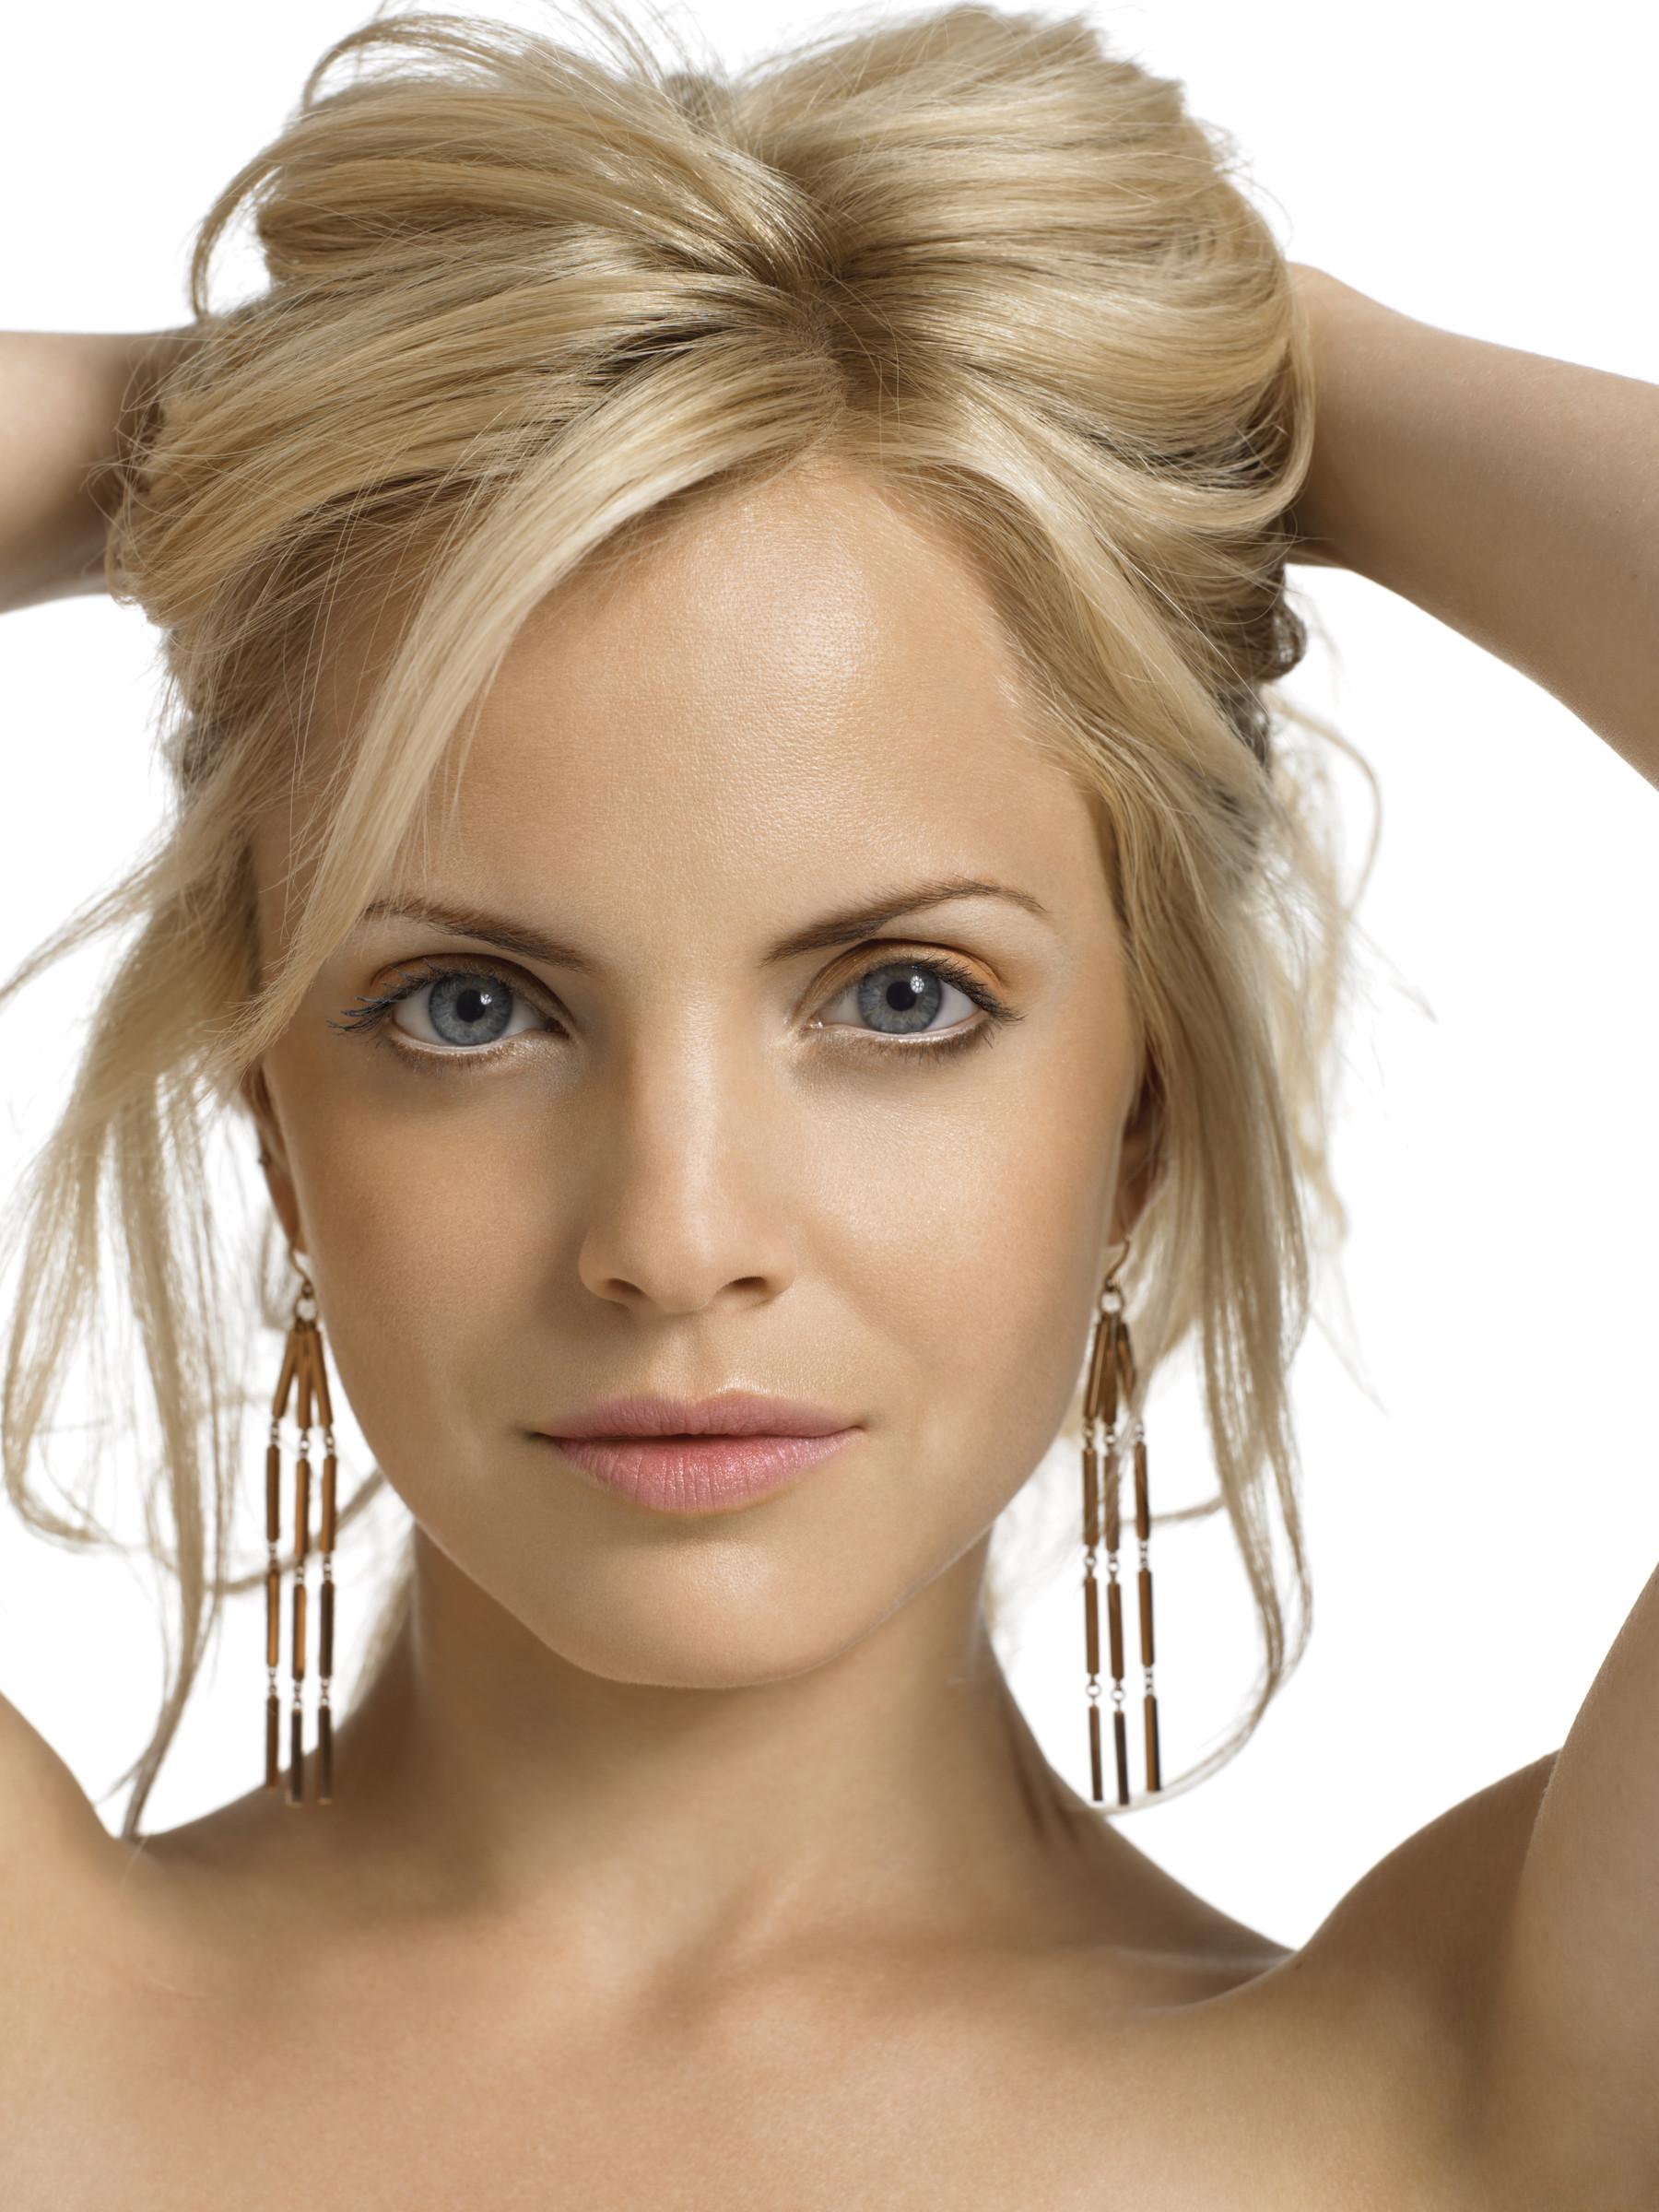 Blonde Messy hair